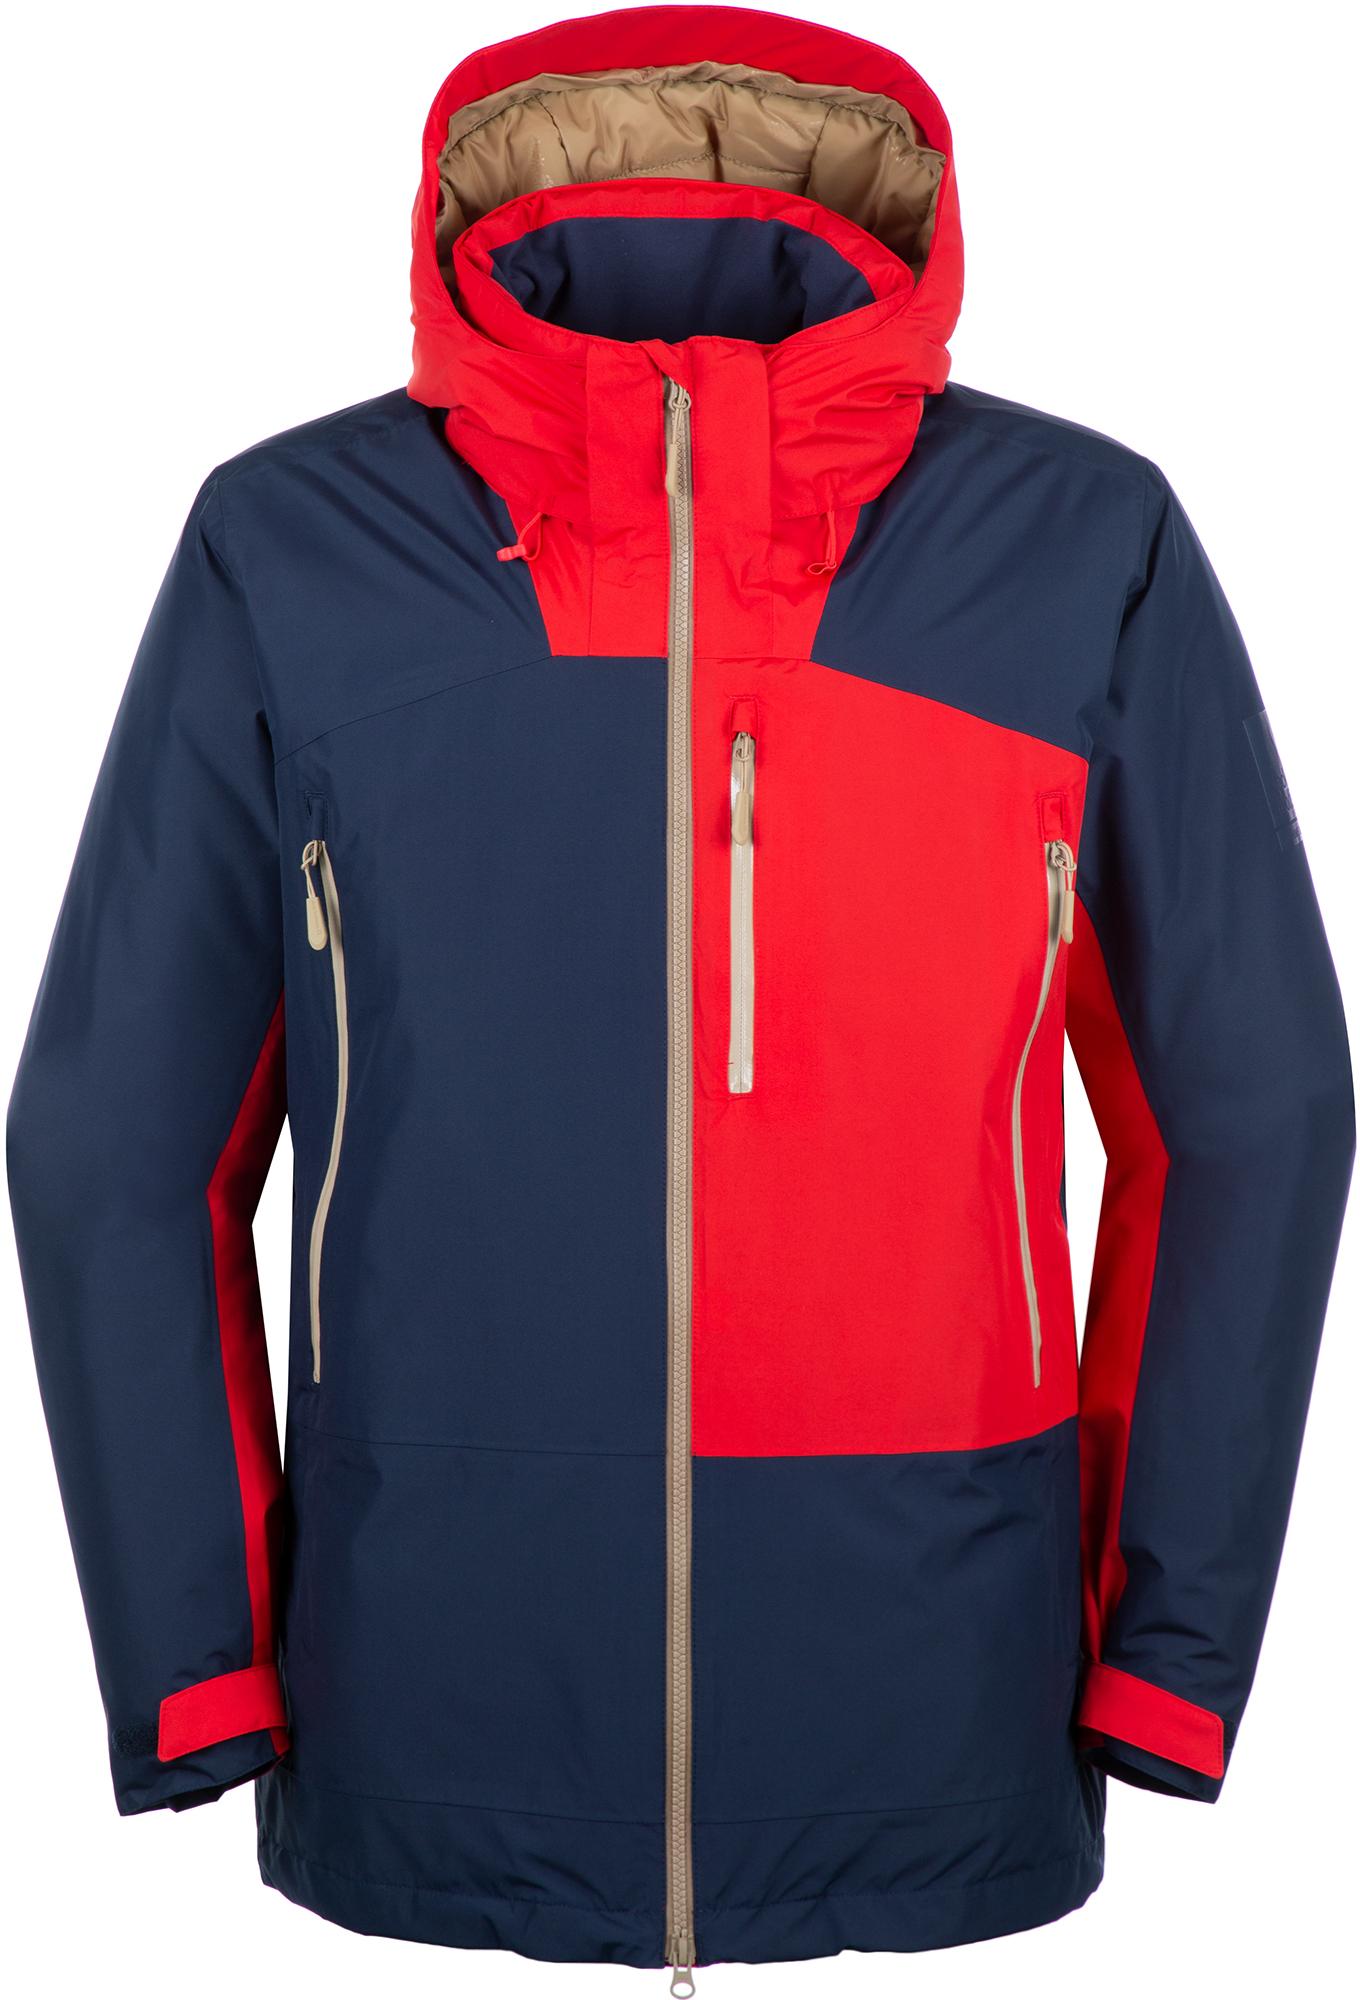 Jack Wolfskin Куртка утепленная мужская JACK WOLFSKIN 365 OnTheMove, размер 54-56